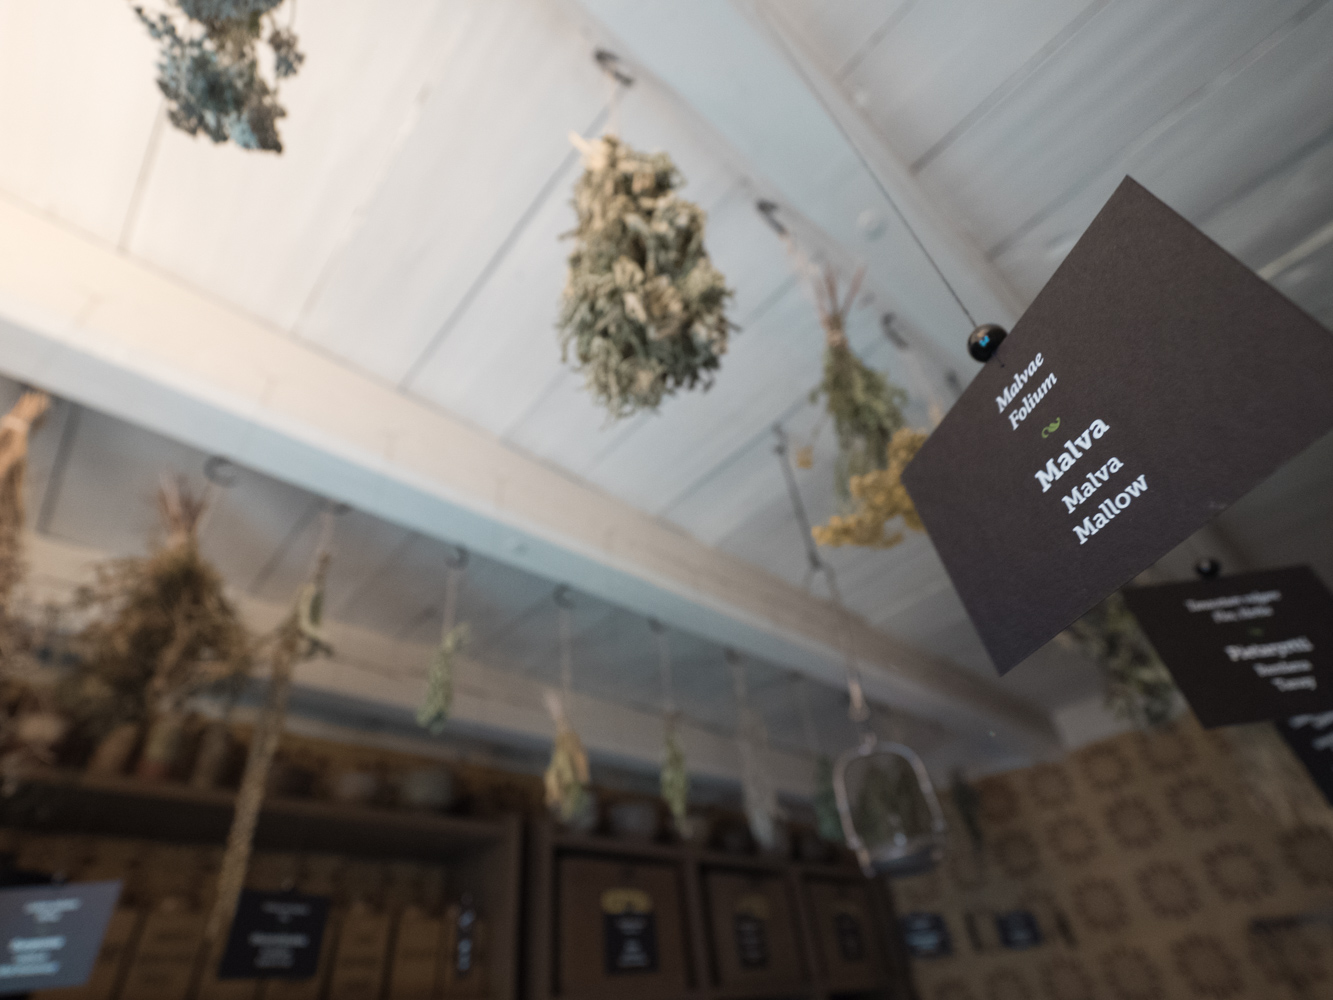 Apothekermuseum Turku